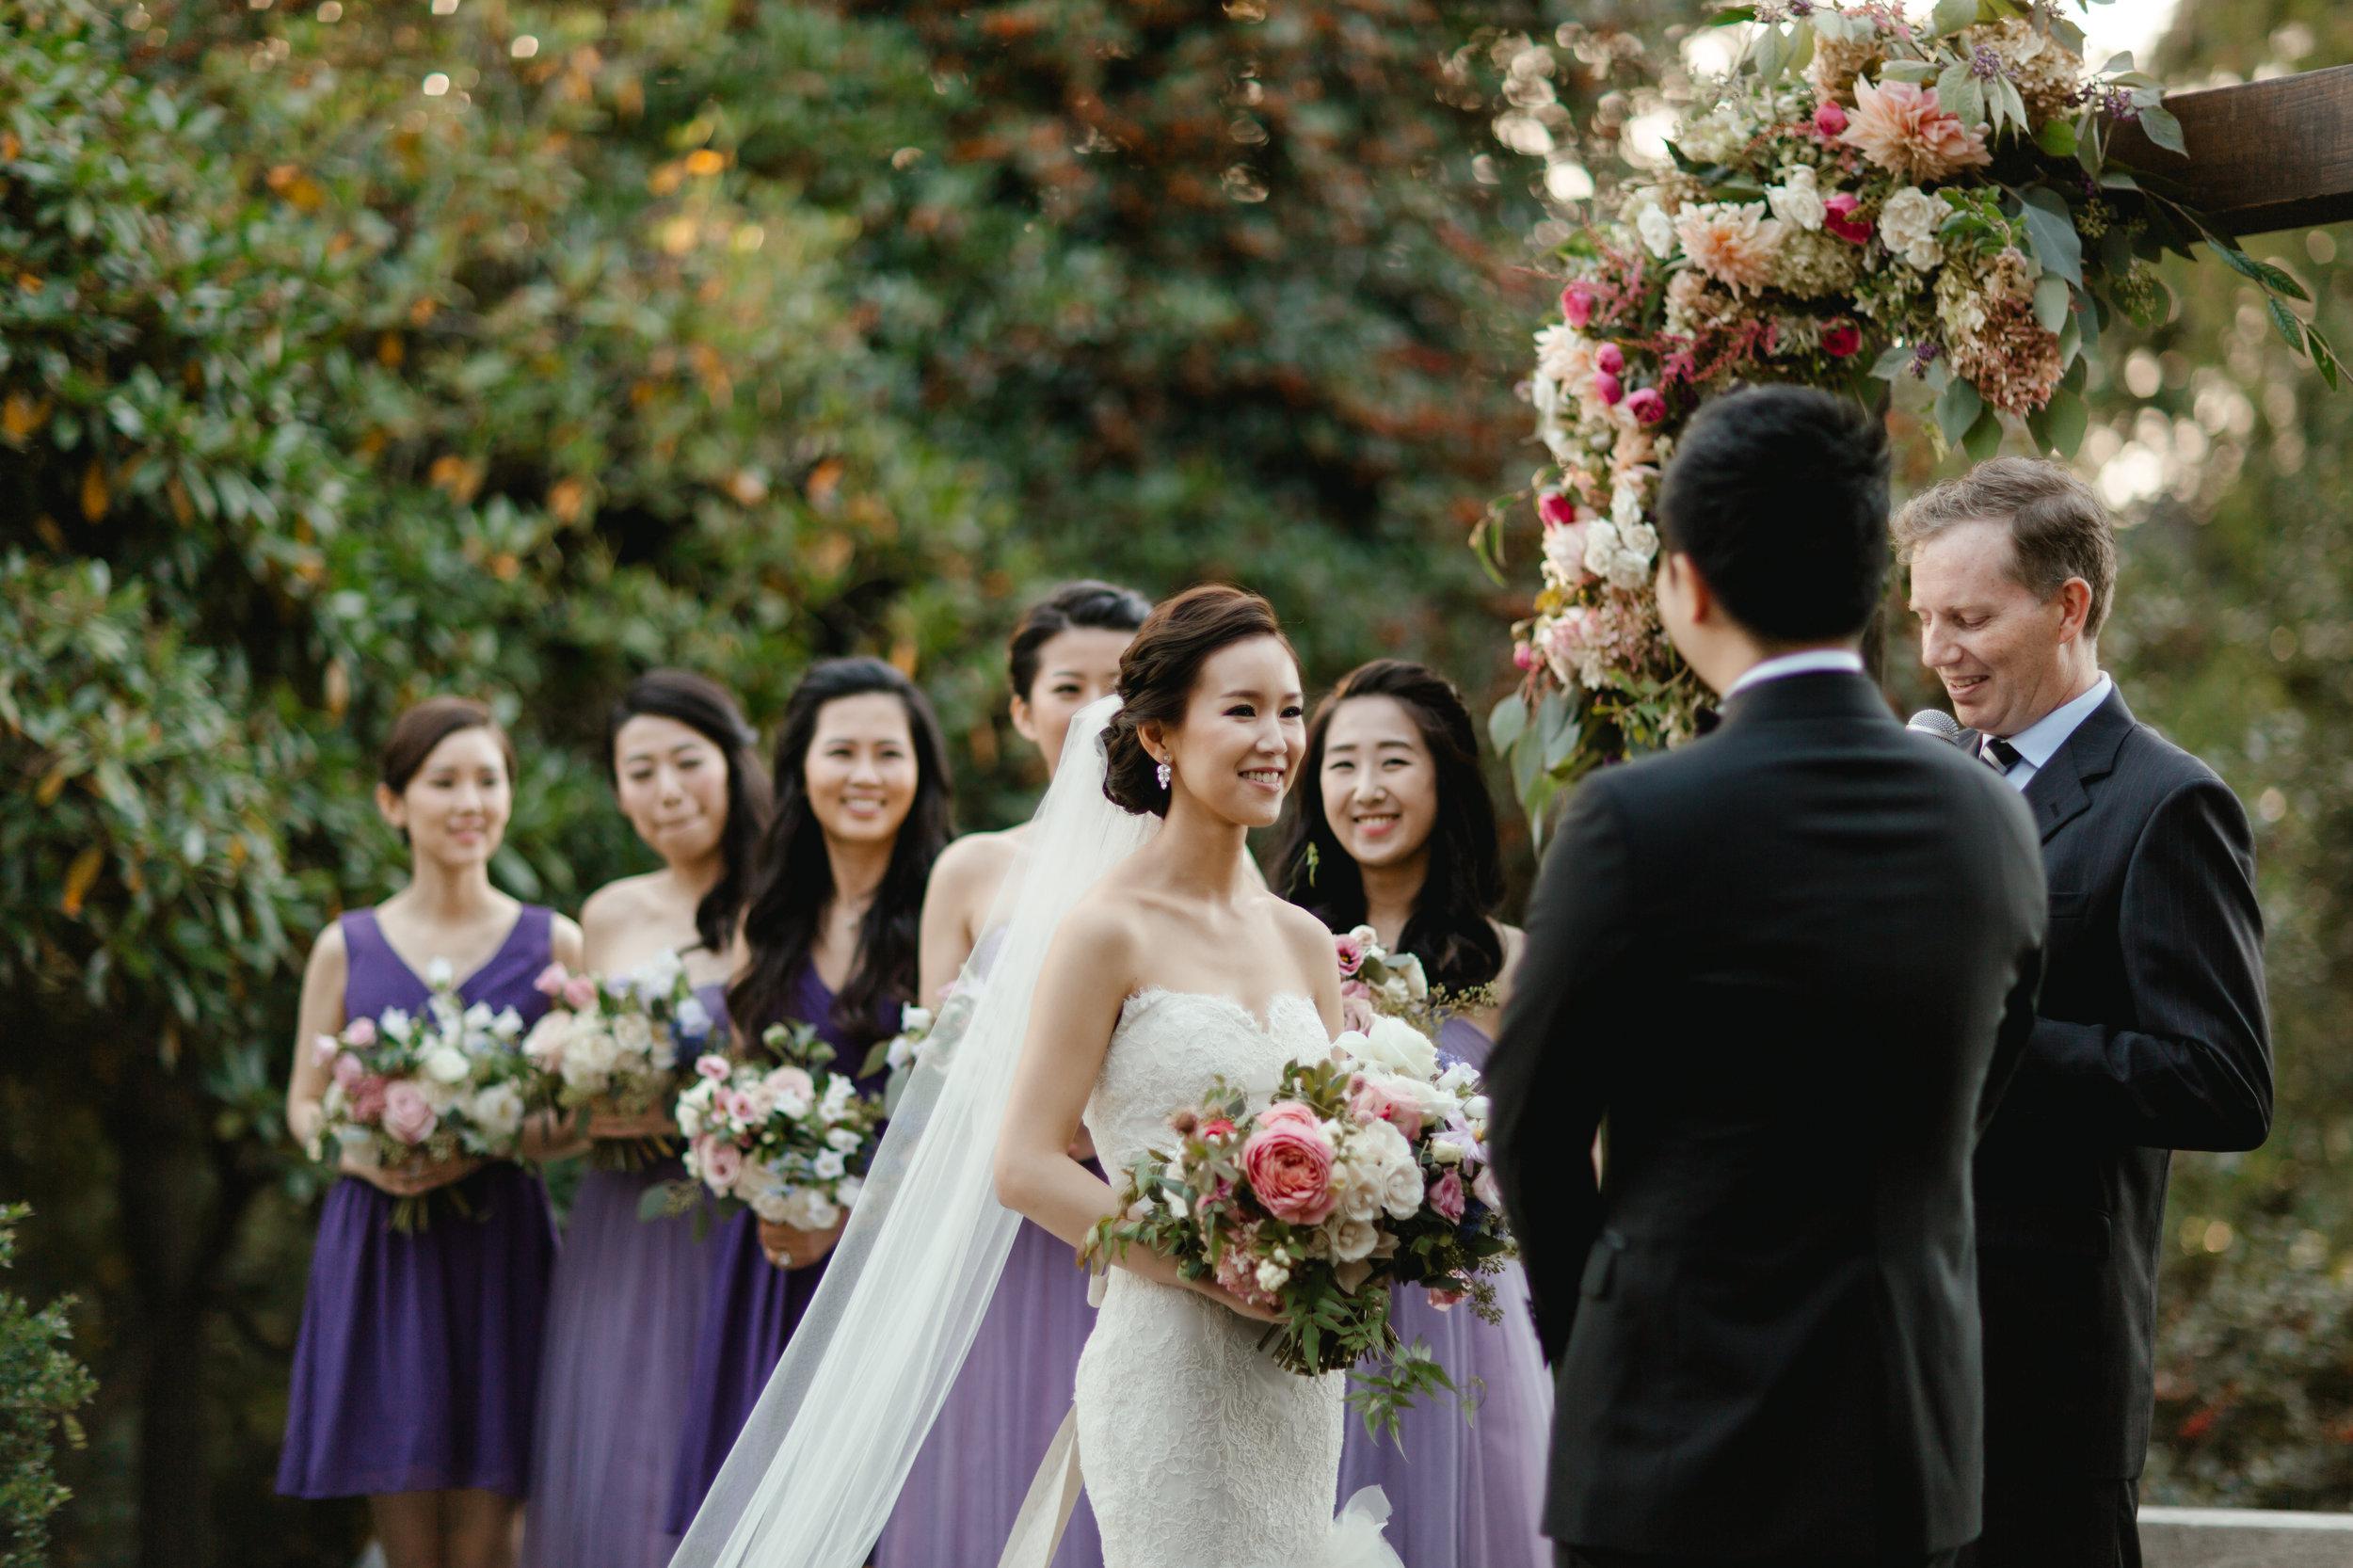 herafilms_wedding_sara_lei_hera_selects-33.jpg